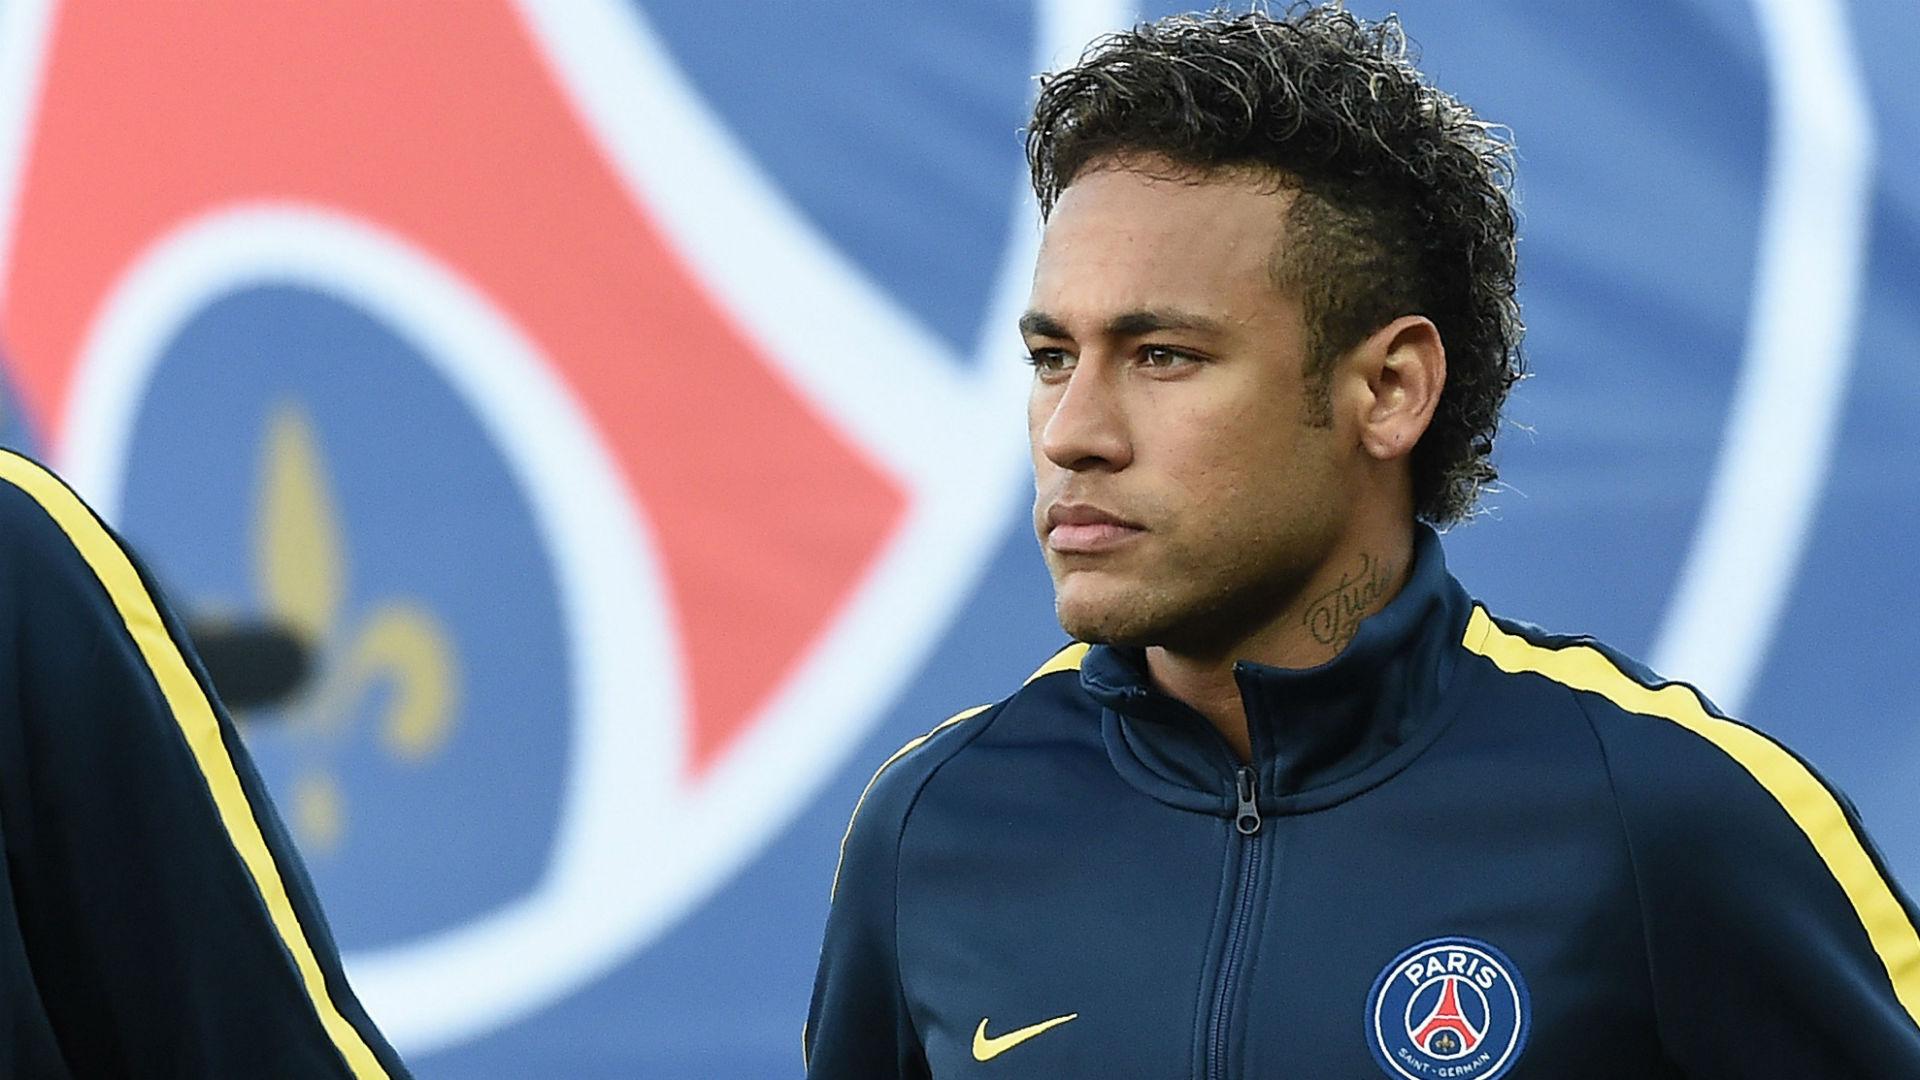 Neymar-guingamp-psg-ligue-1-13082017_9zgwbd54zoys1dil6acqfffkp